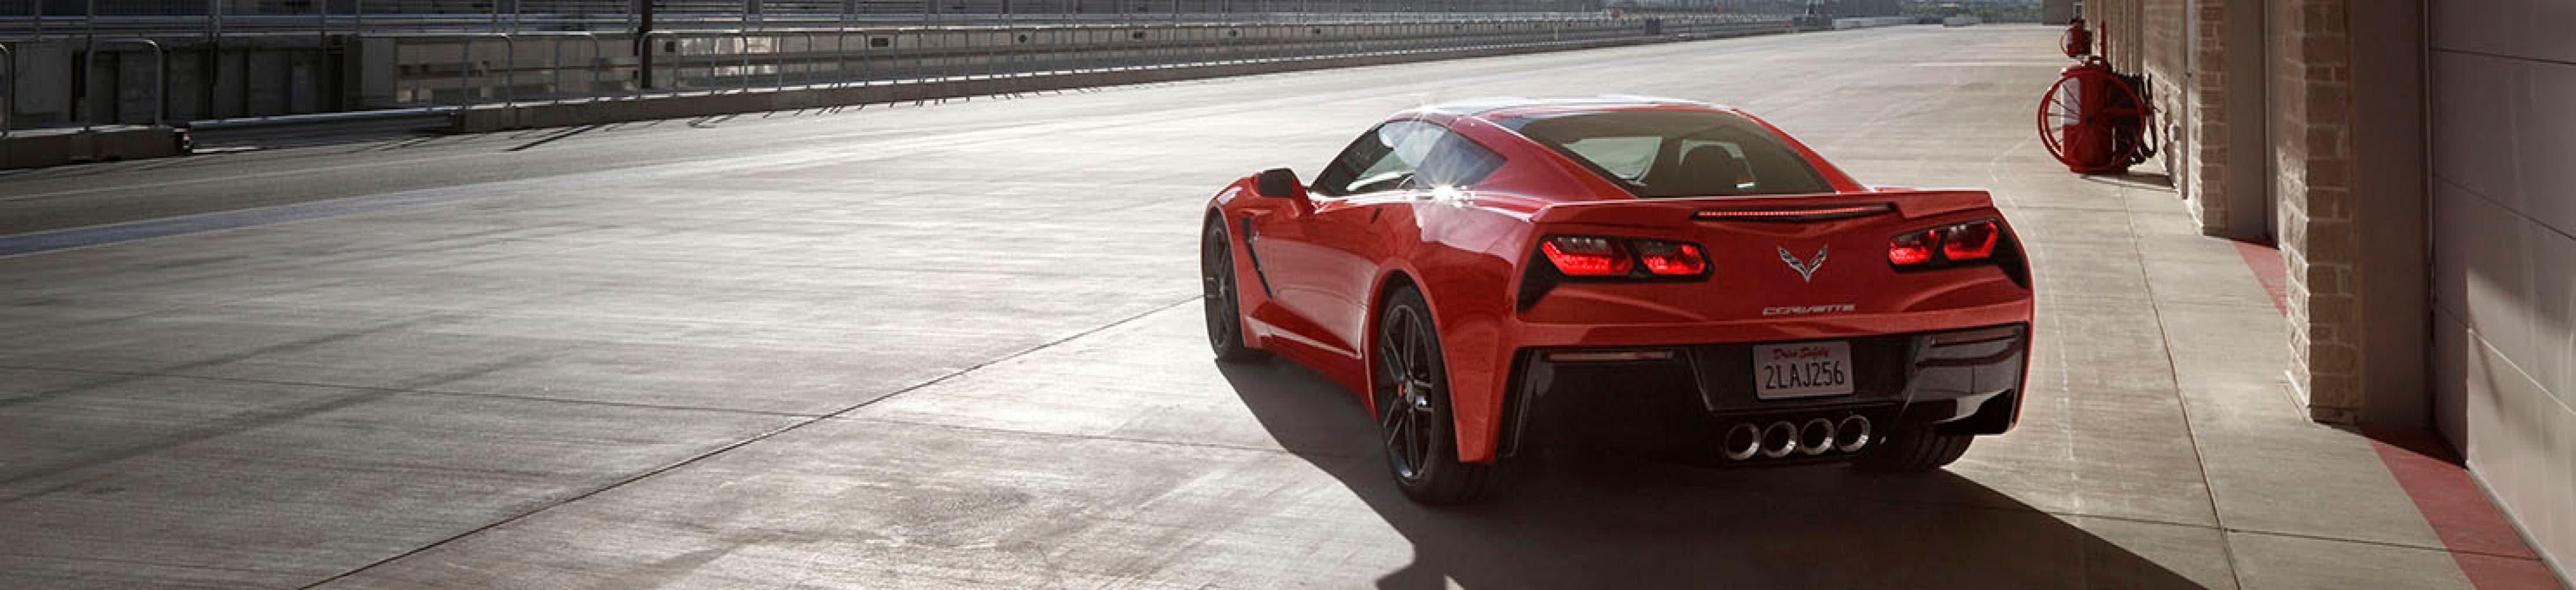 Corvette Rental Luxury Sports Coupe Avis Rent A Car